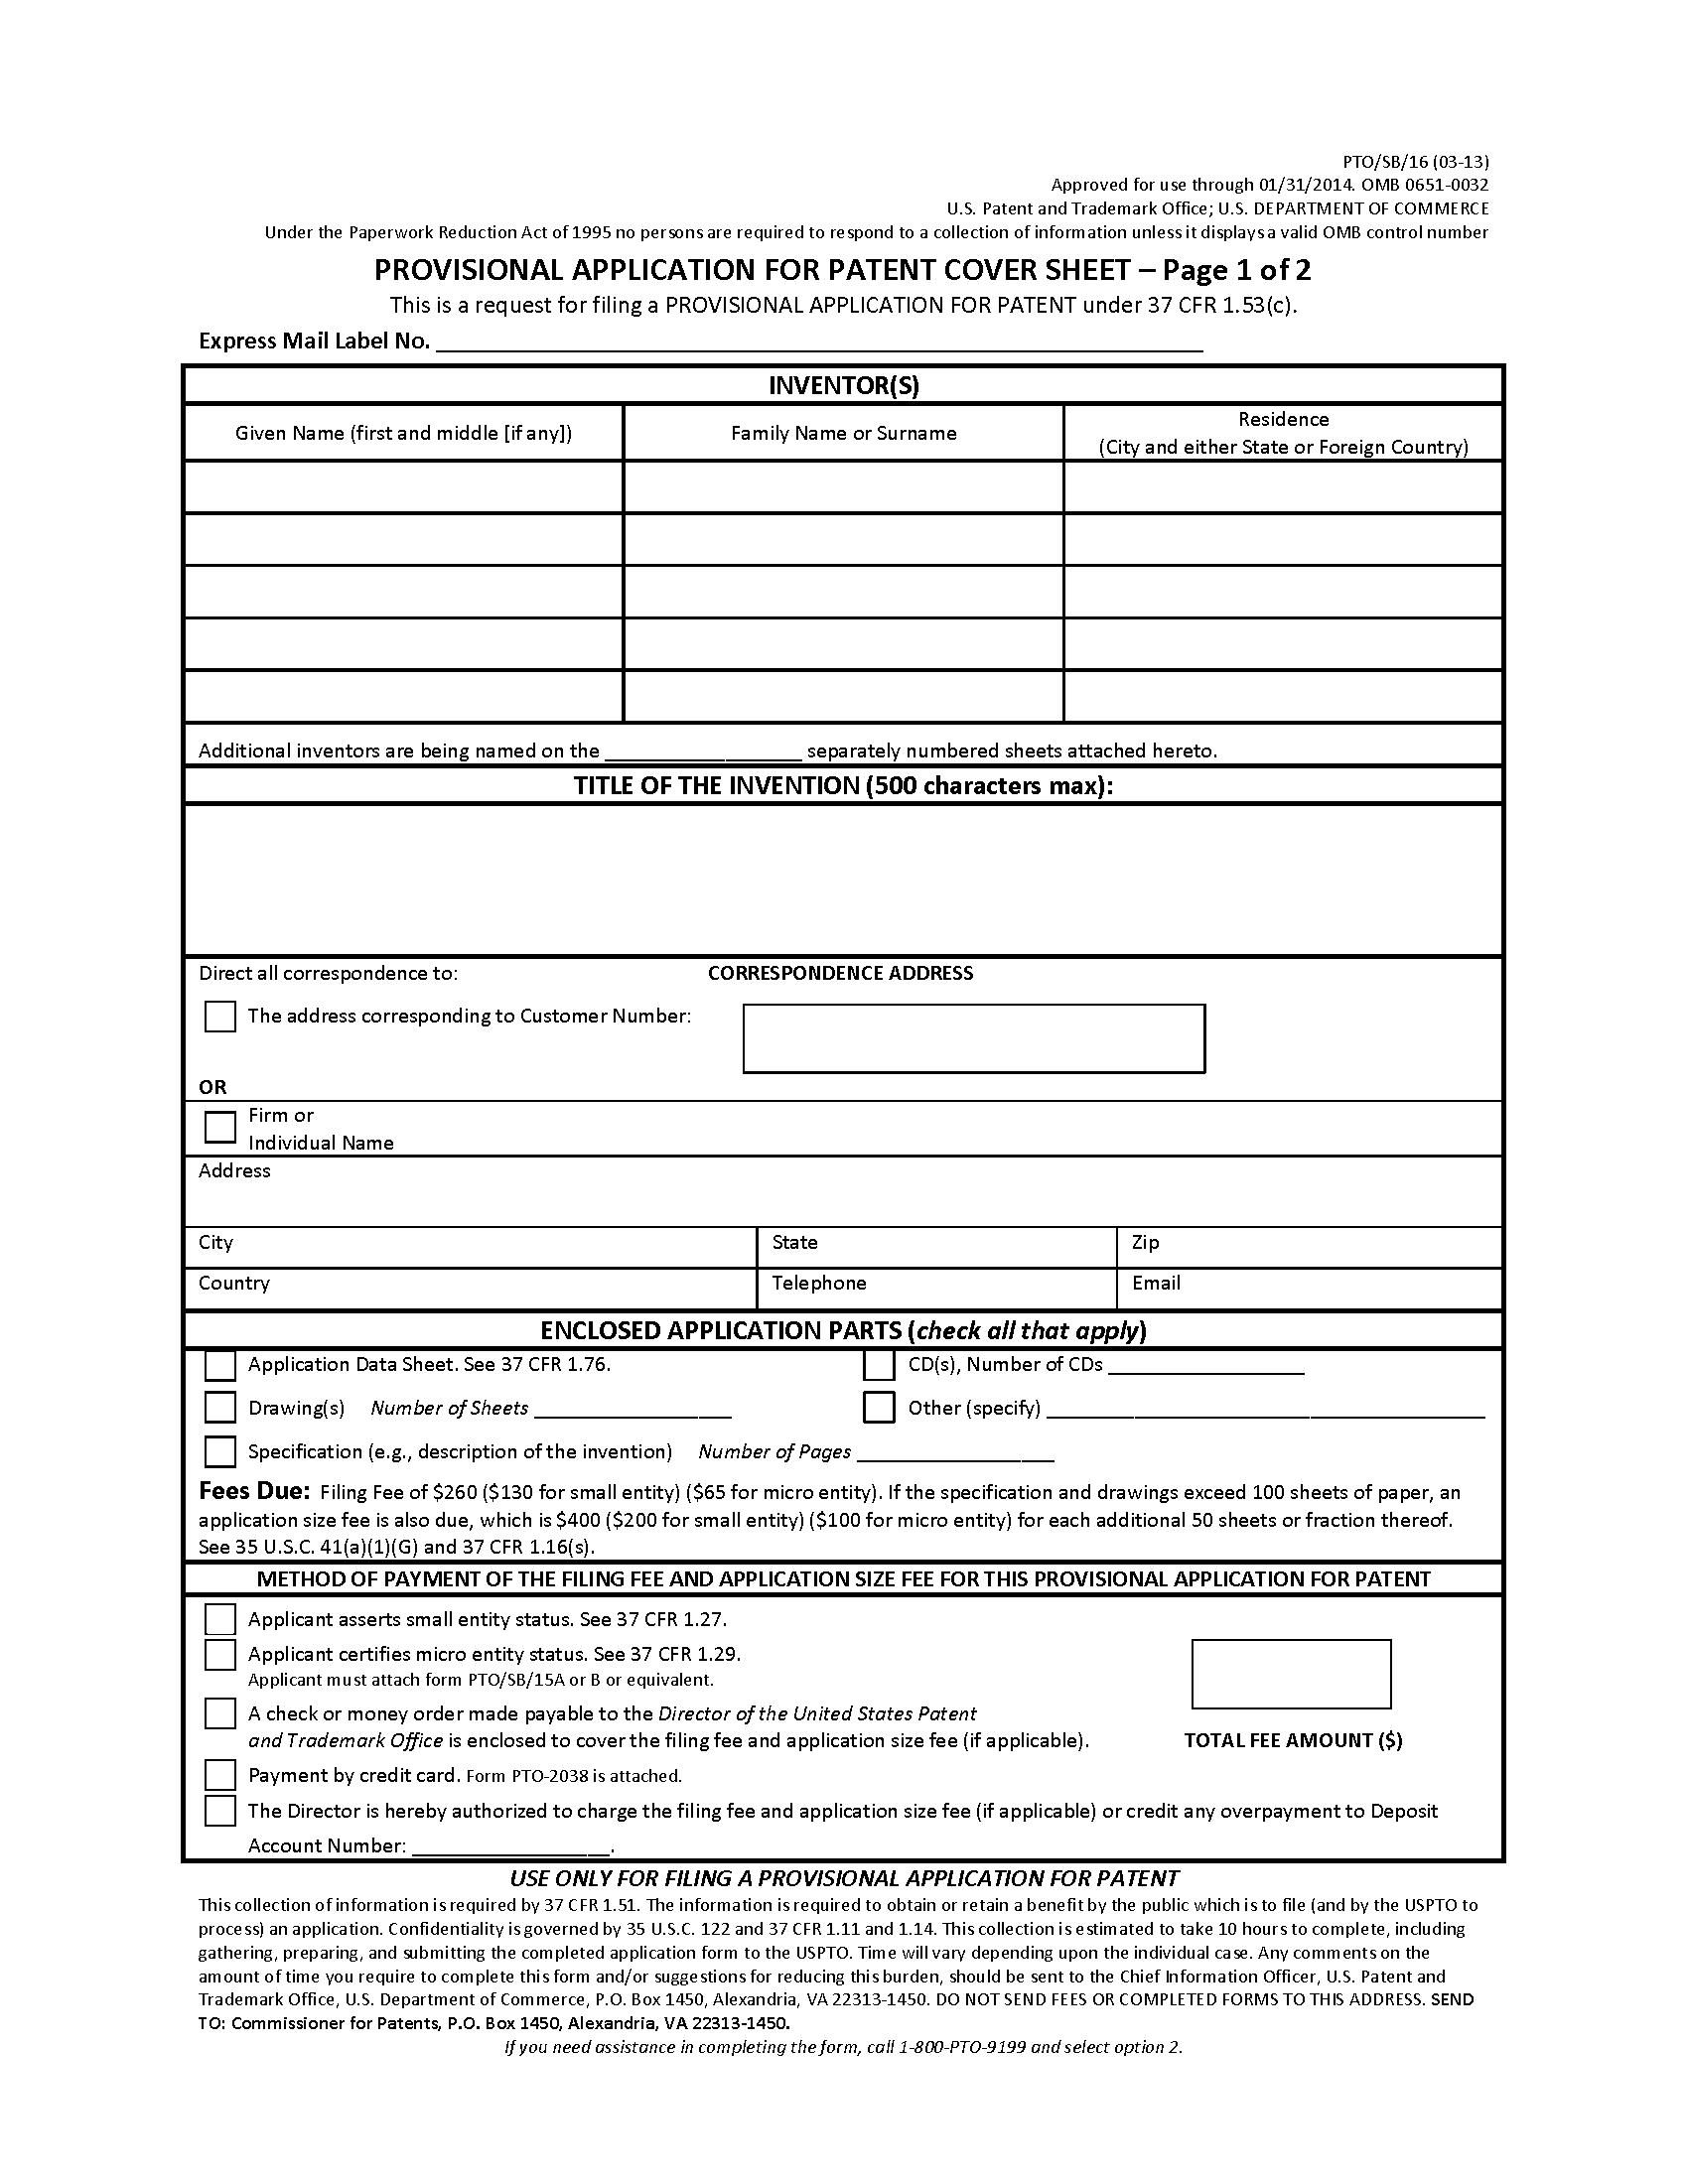 open pdf in web page